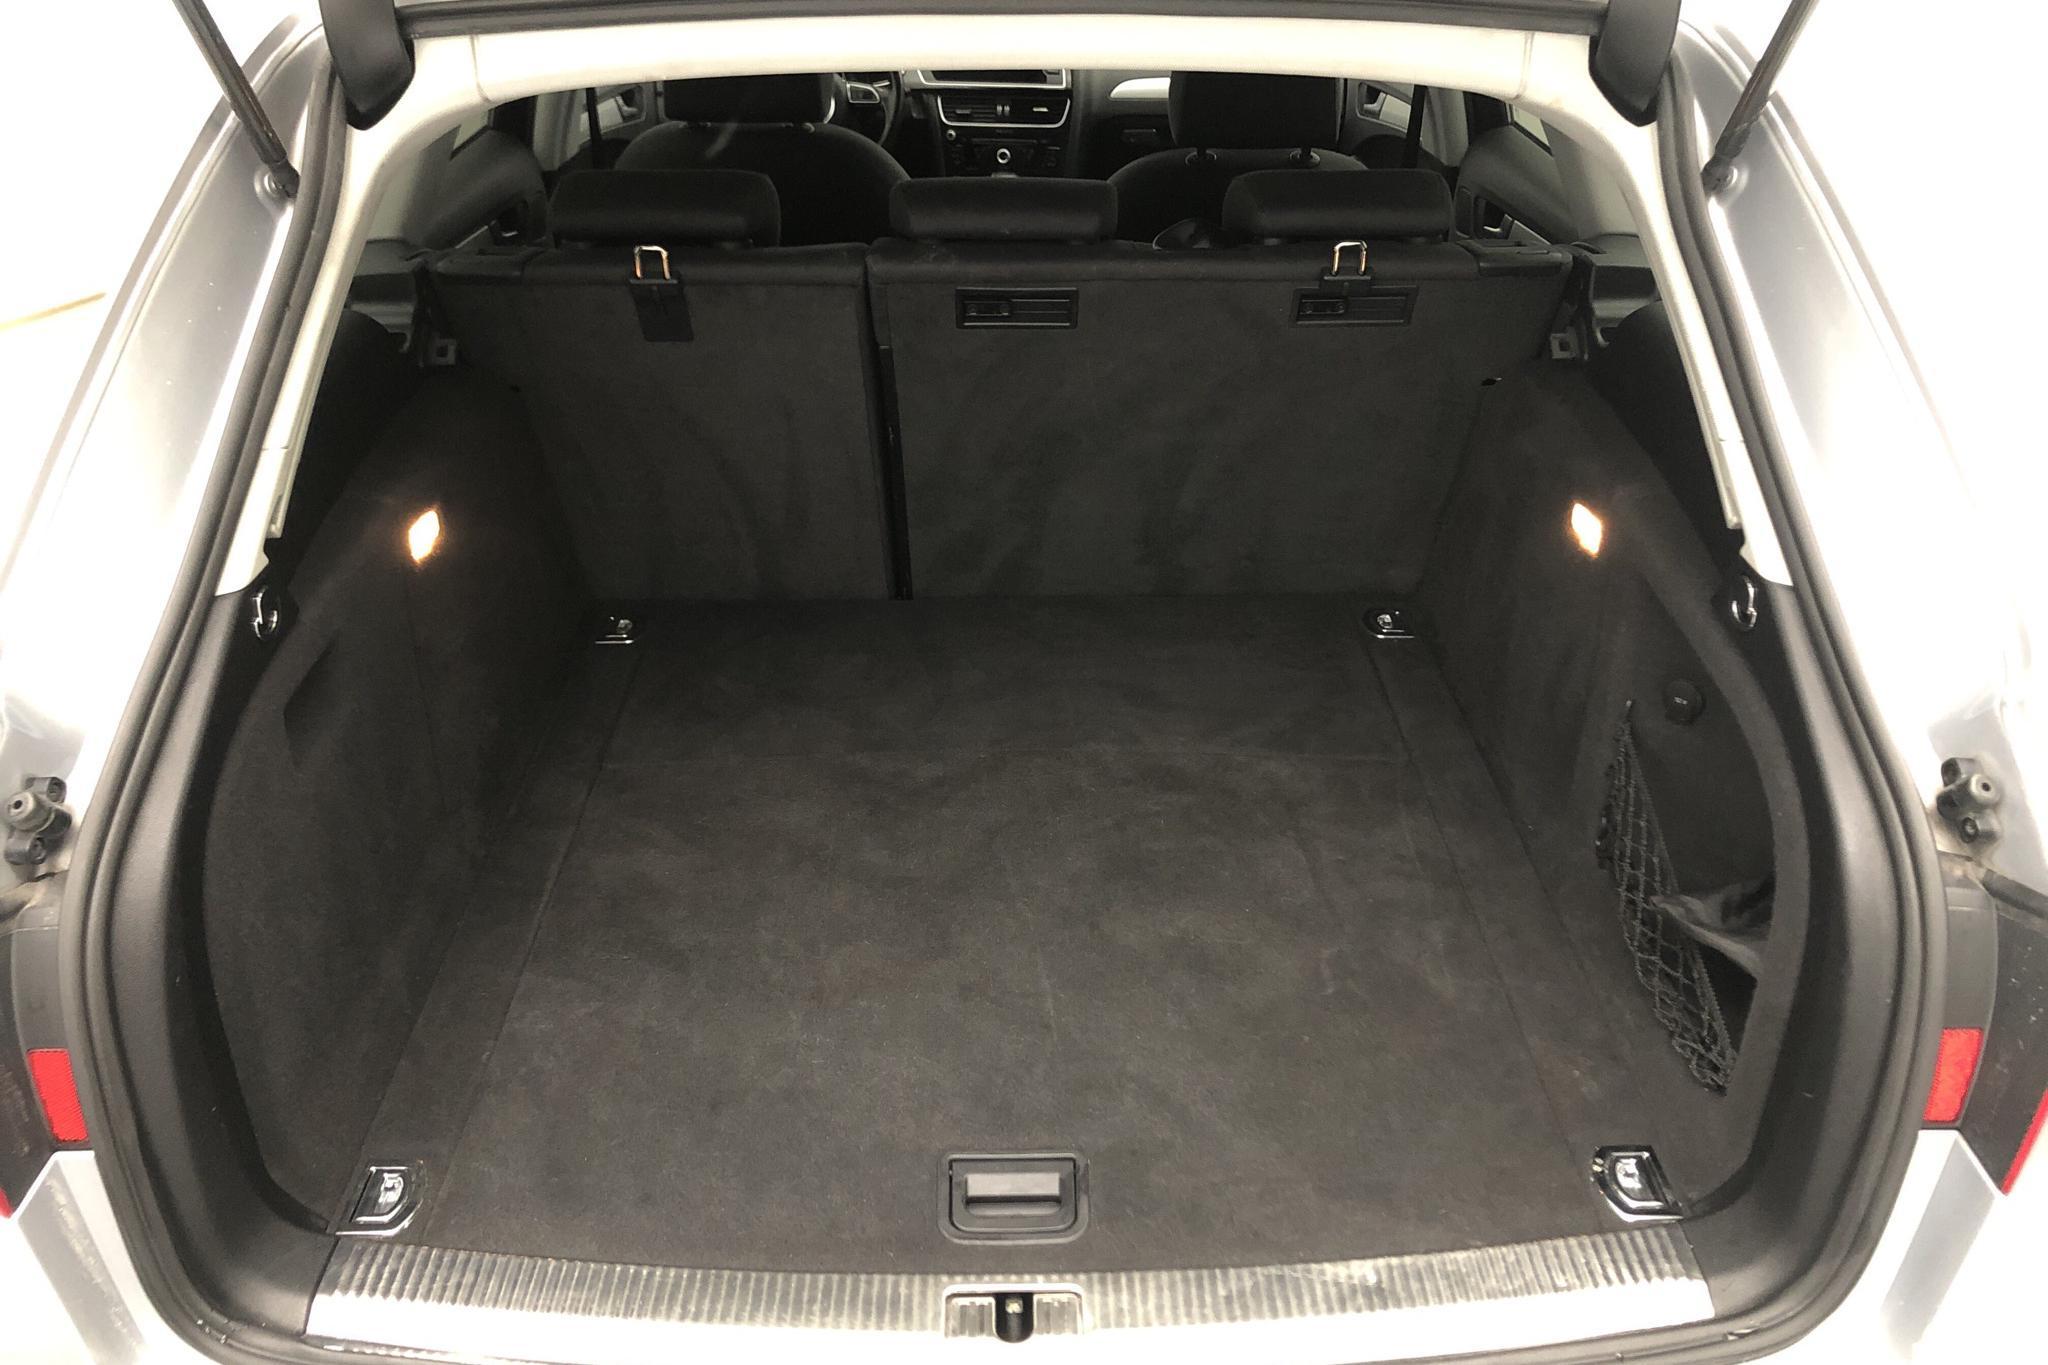 Audi A4 2.0 TDI clean diesel Avant quattro (190hk) - 8 613 mil - Automat - silver - 2015